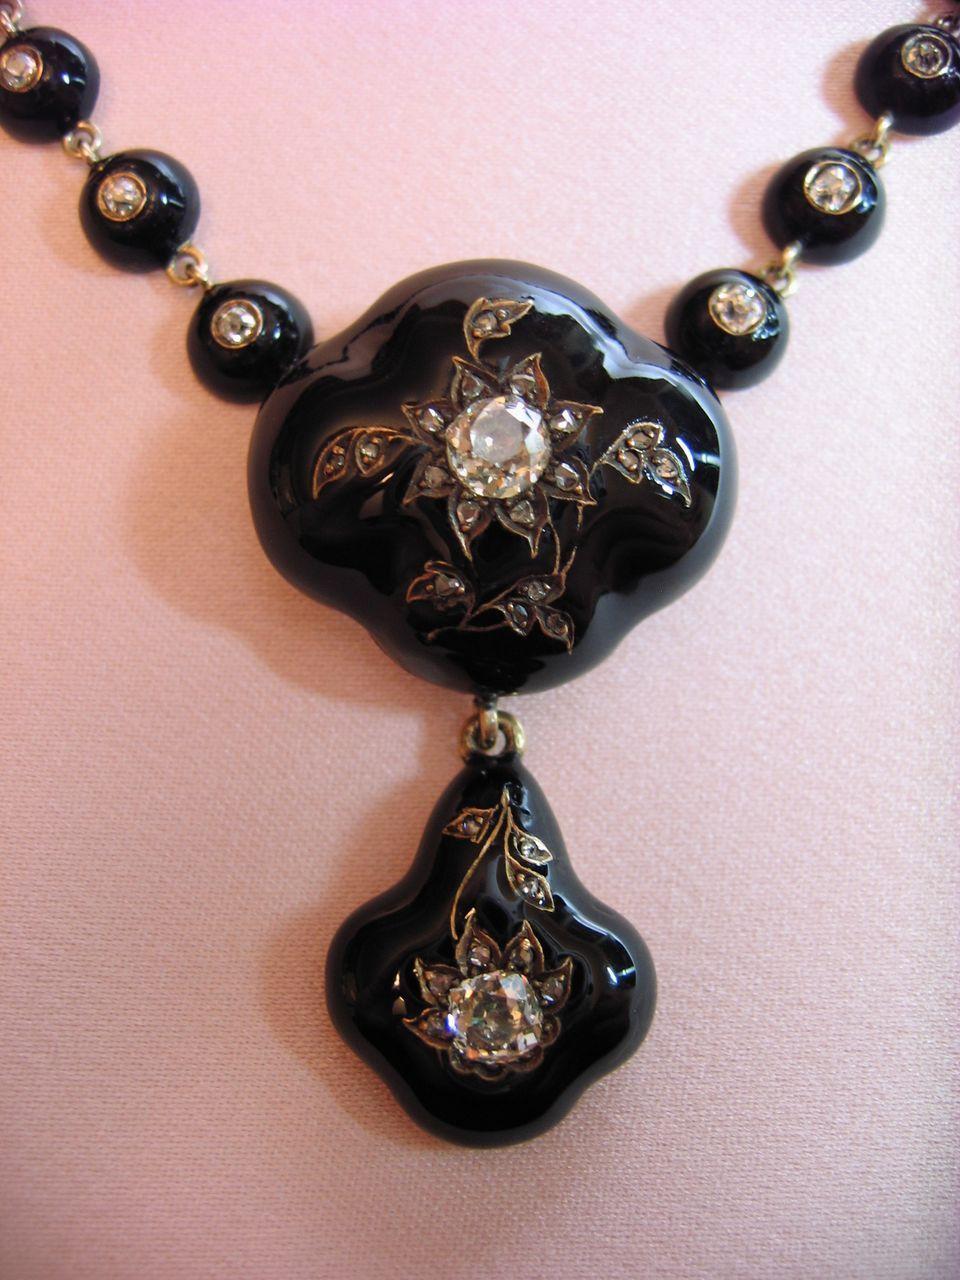 Victorian Era European Cut  Diamond And Enamel Necklace, 18 Karat